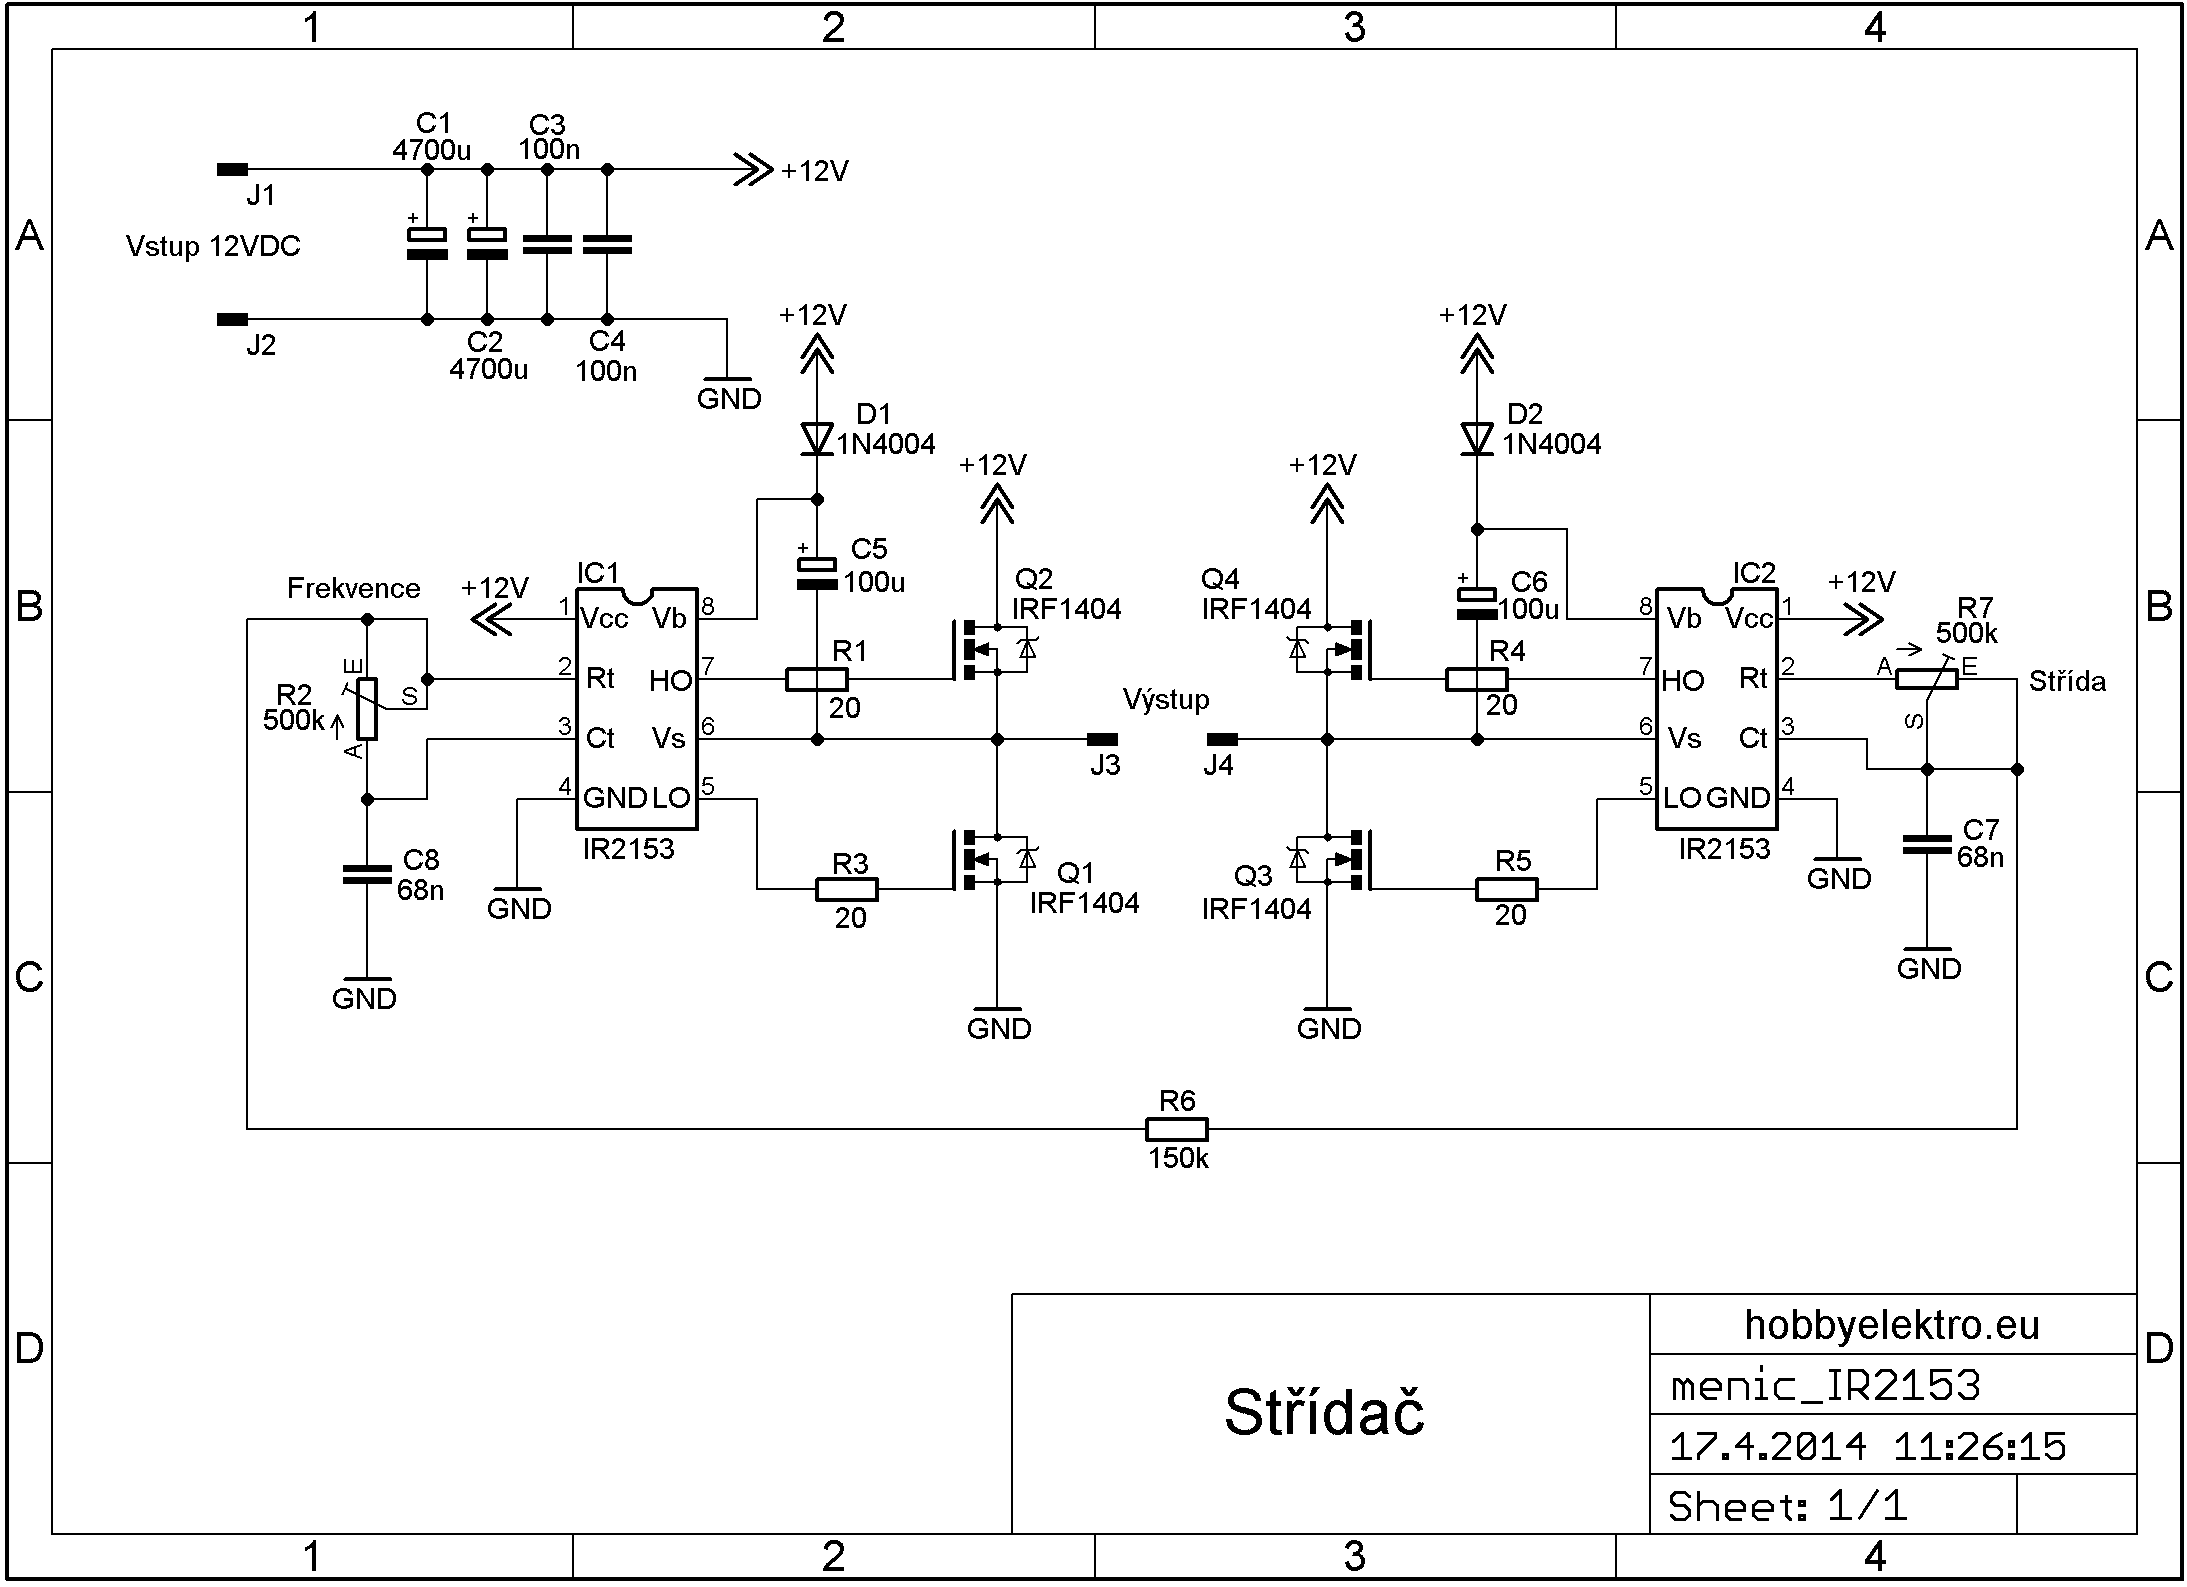 https://www.hobbyelektro.eu/wp-content/uploads/2019/05/schema.png